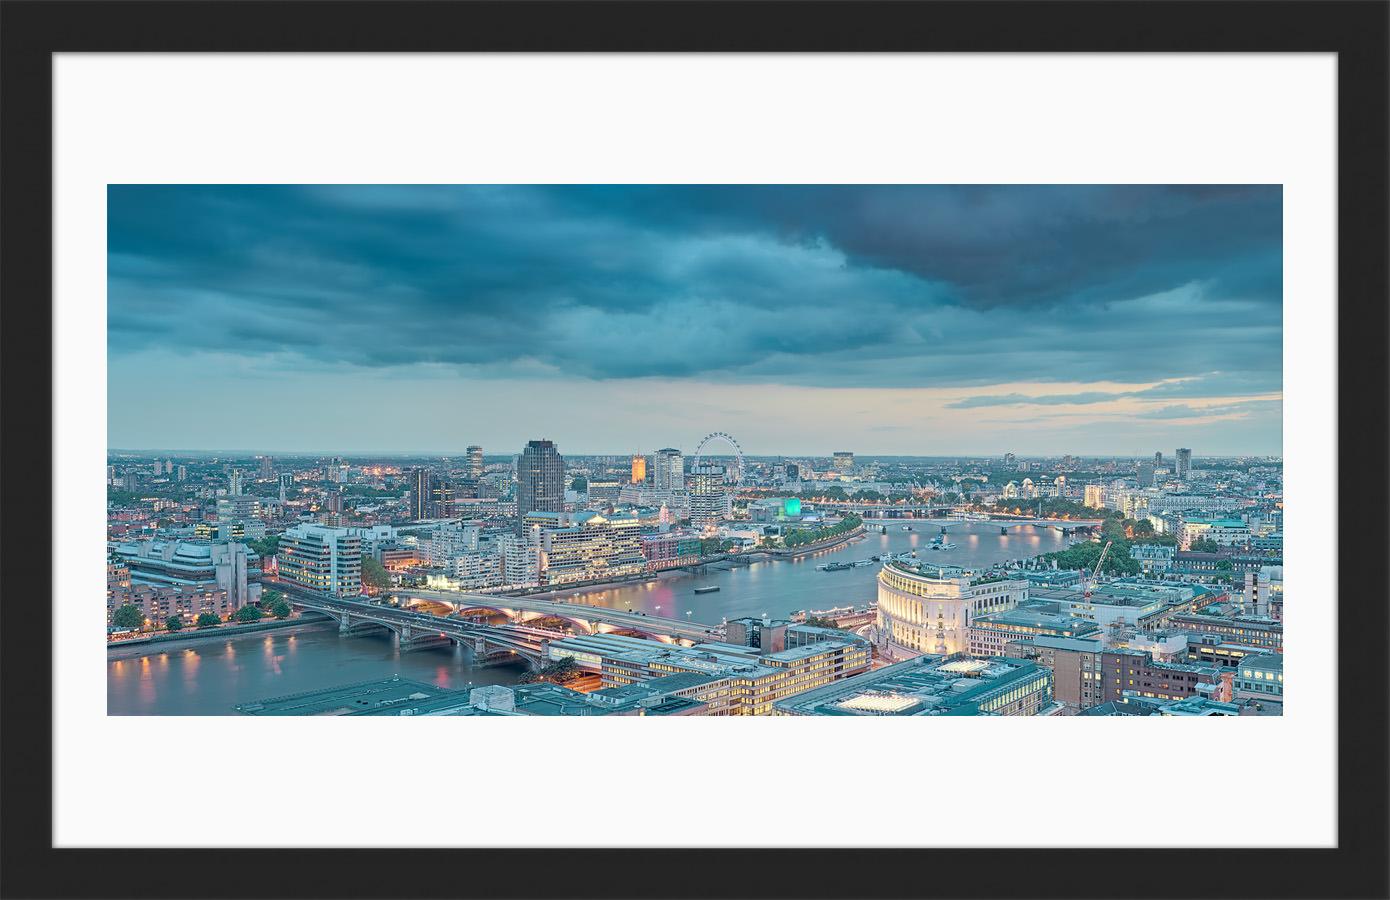 View From St Pauls 2009 - Framed London Fine Art Print